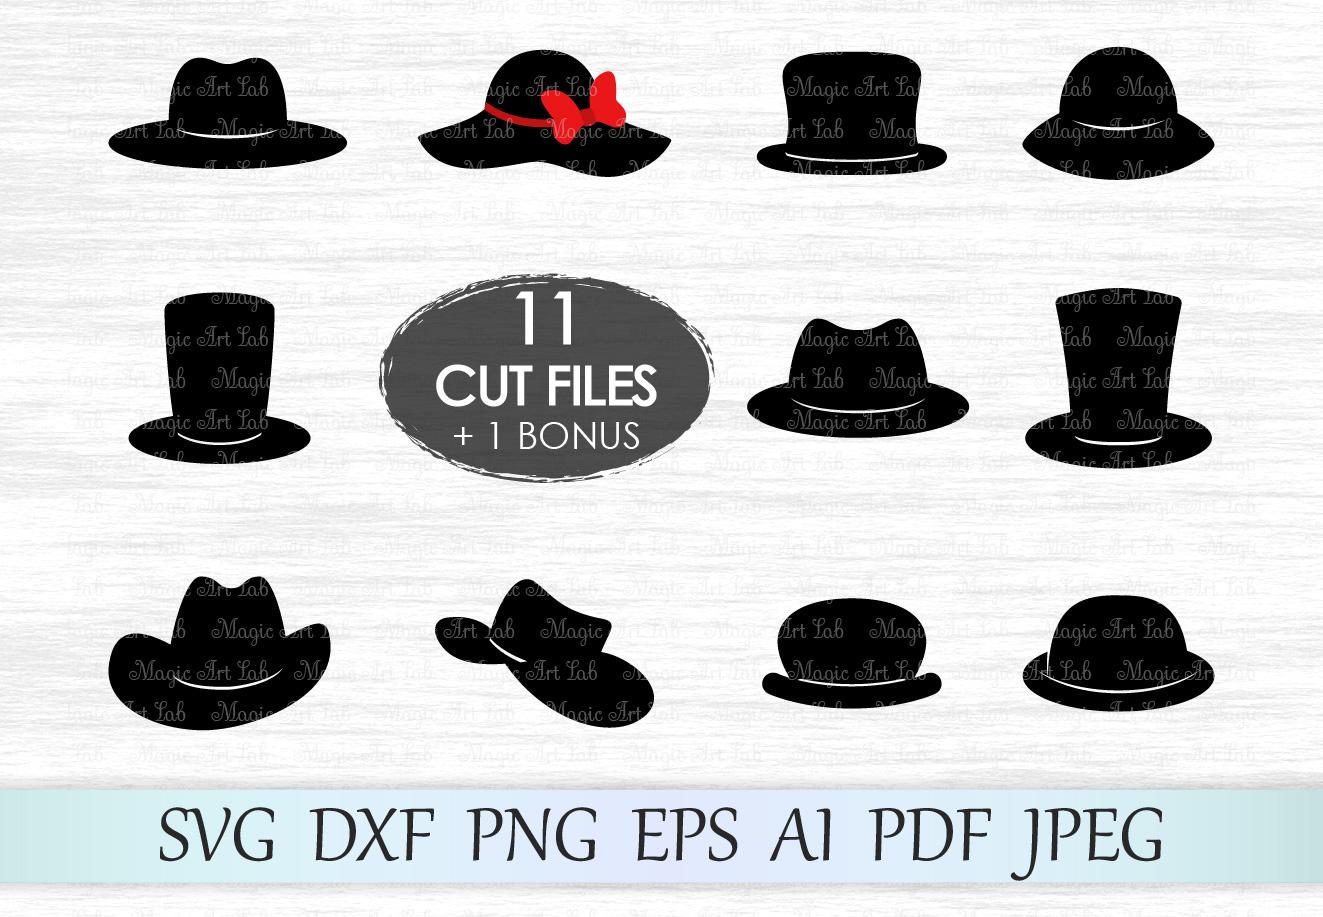 Hat svg, Hats clipart, Photo booth, Bowler svg, Cowboy hat svg, Derby hat svg, Top hat svg, Floppy hat svg, Woman hat cut file, Hat svg bundle example image 1